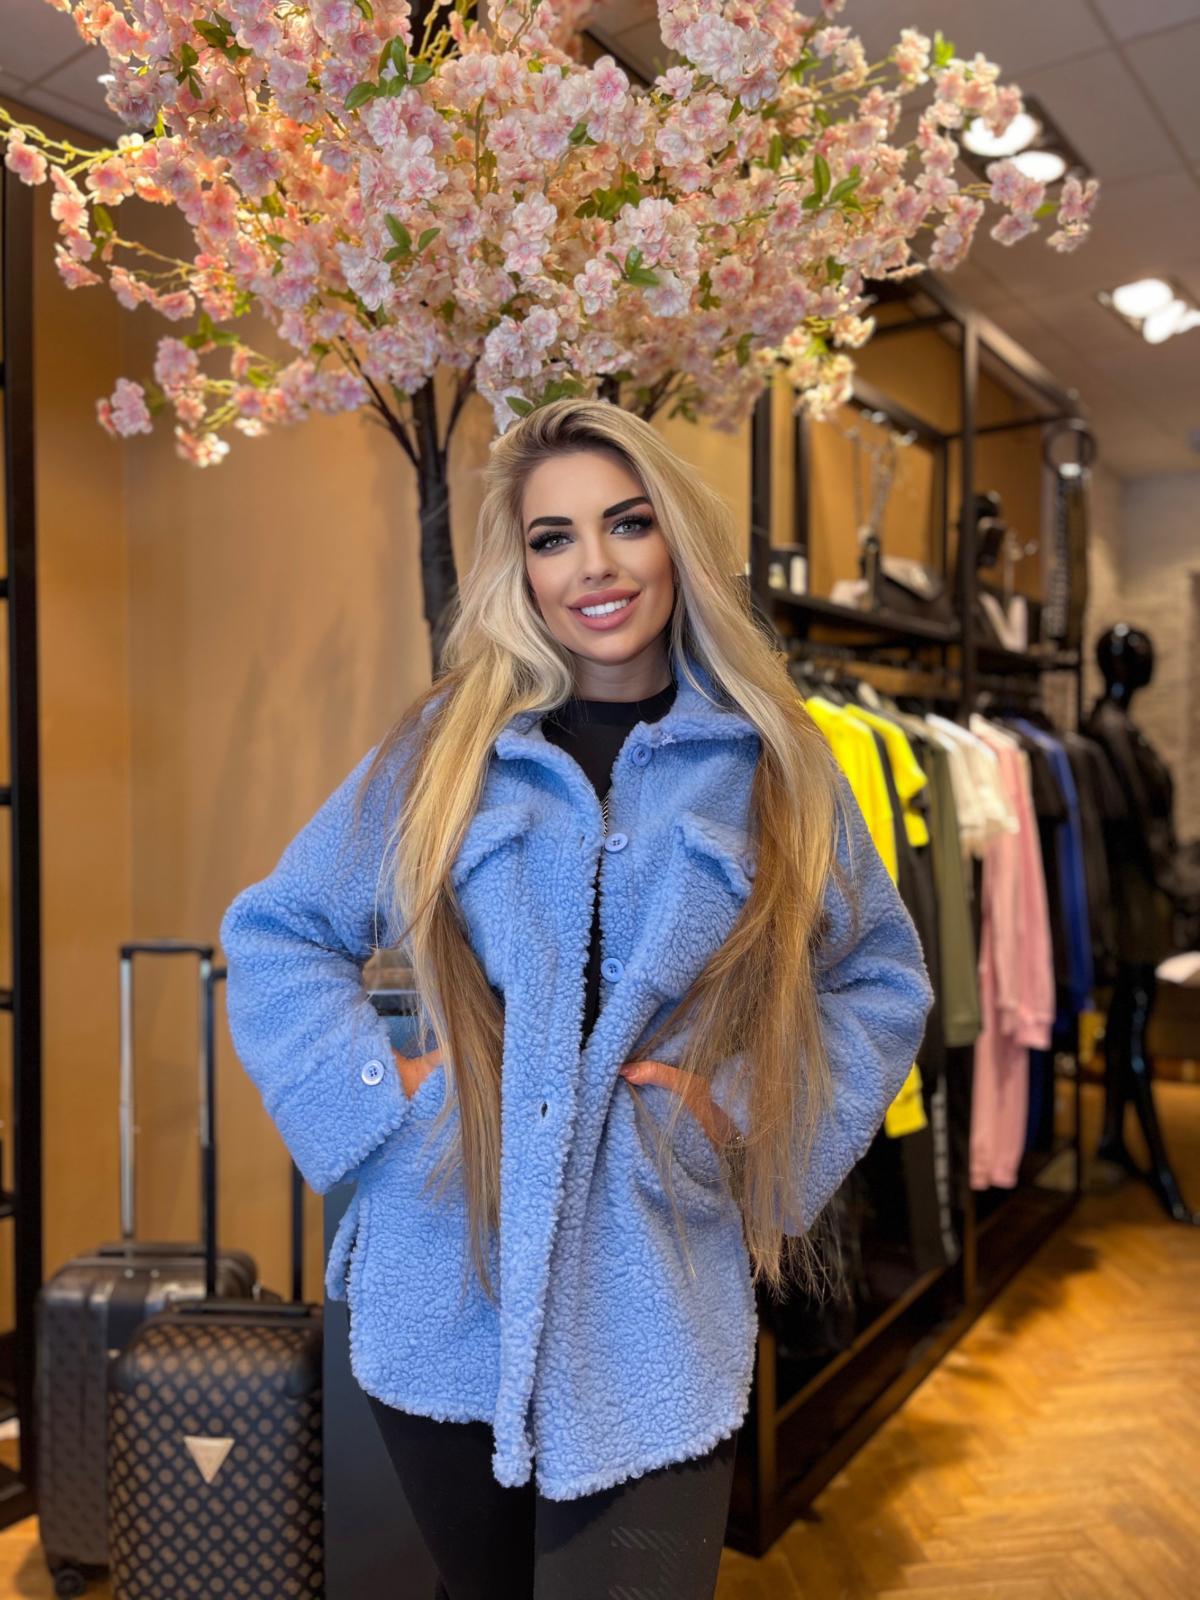 Sharon Coat blauw Model NEW💙